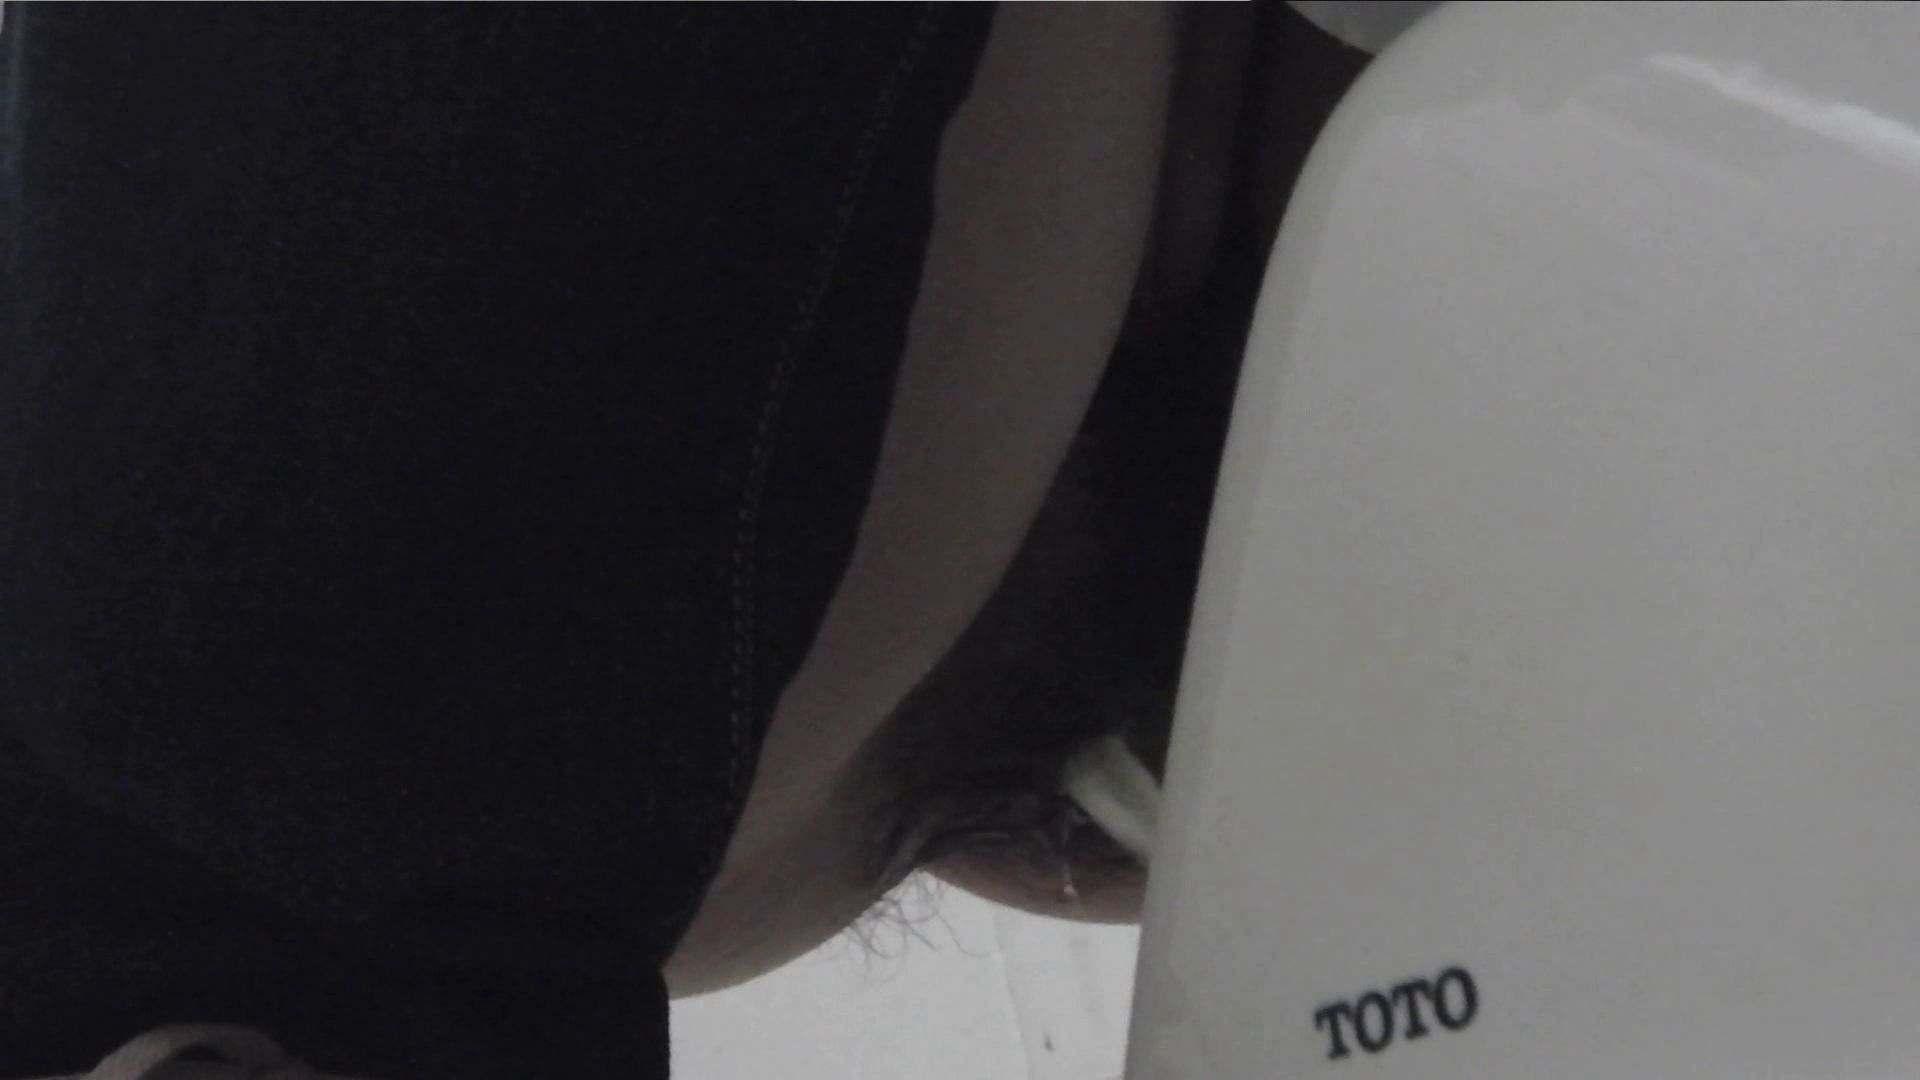 vol.08 命がけ潜伏洗面所! 黒ストッキングが流行りです。 プライベート AV無料動画キャプチャ 95pic 83